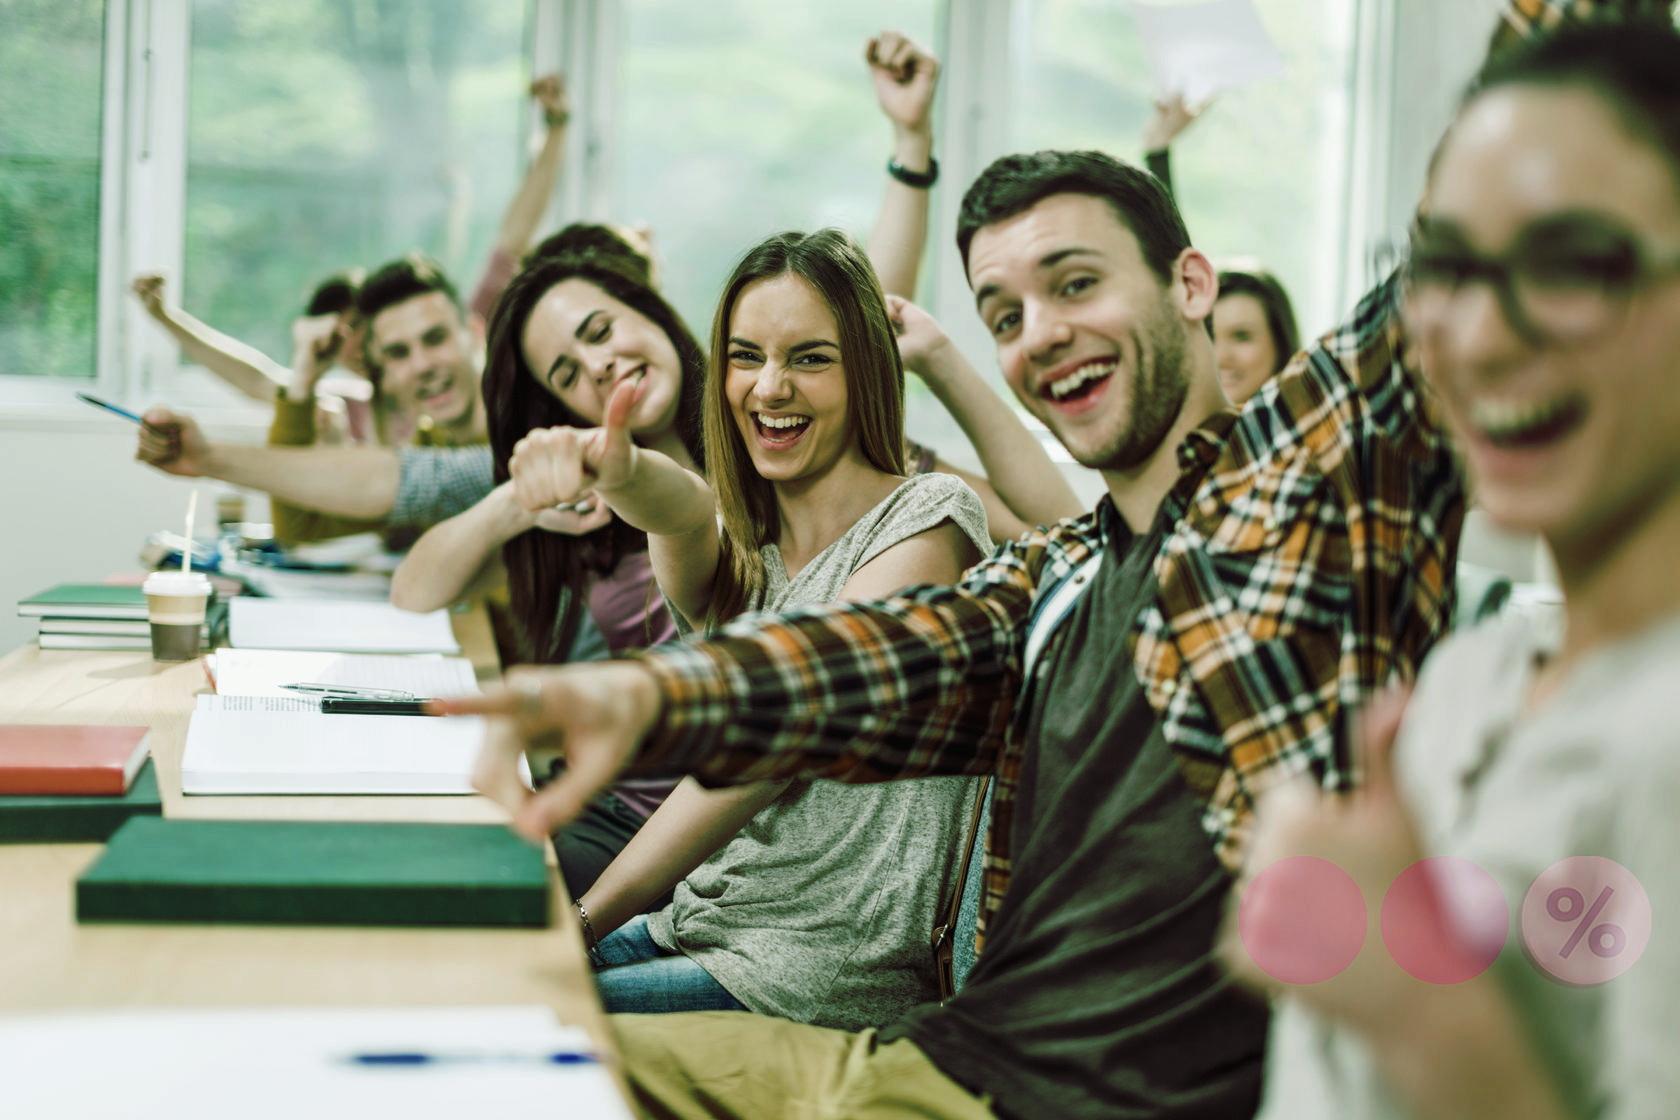 МегаФон предложил мурманским студентам скидку 20% на тарифы #БезПереплат 1